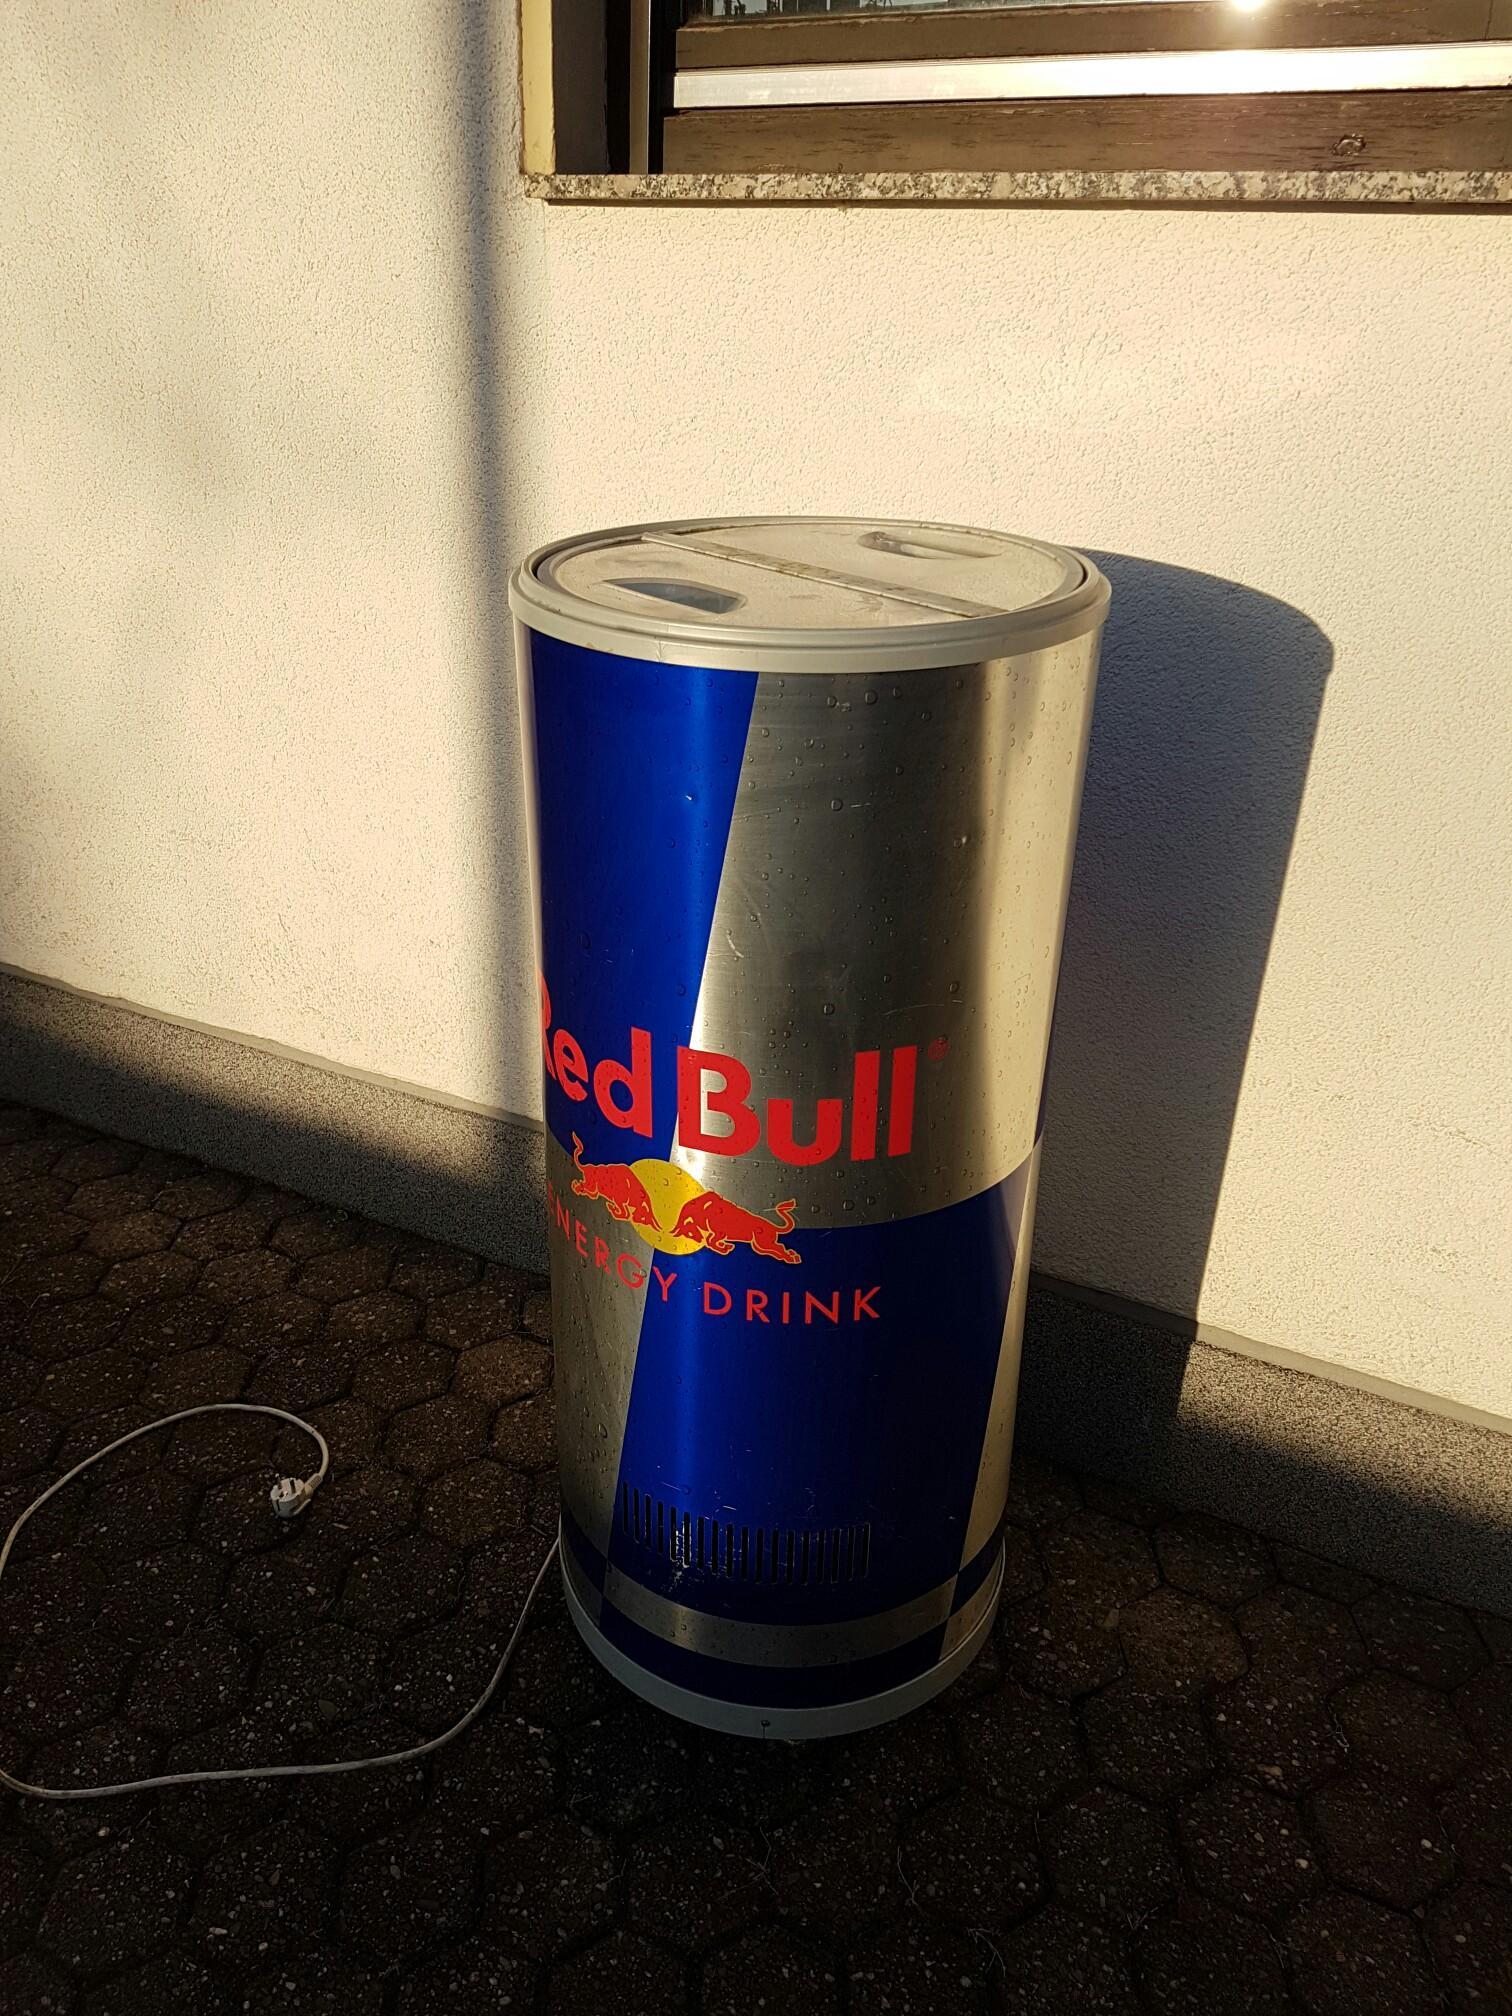 Red Bull Kühlschrank Dose Preis : Red bull kühlschrank dose preis: red bull kühlschrank in wandsbek